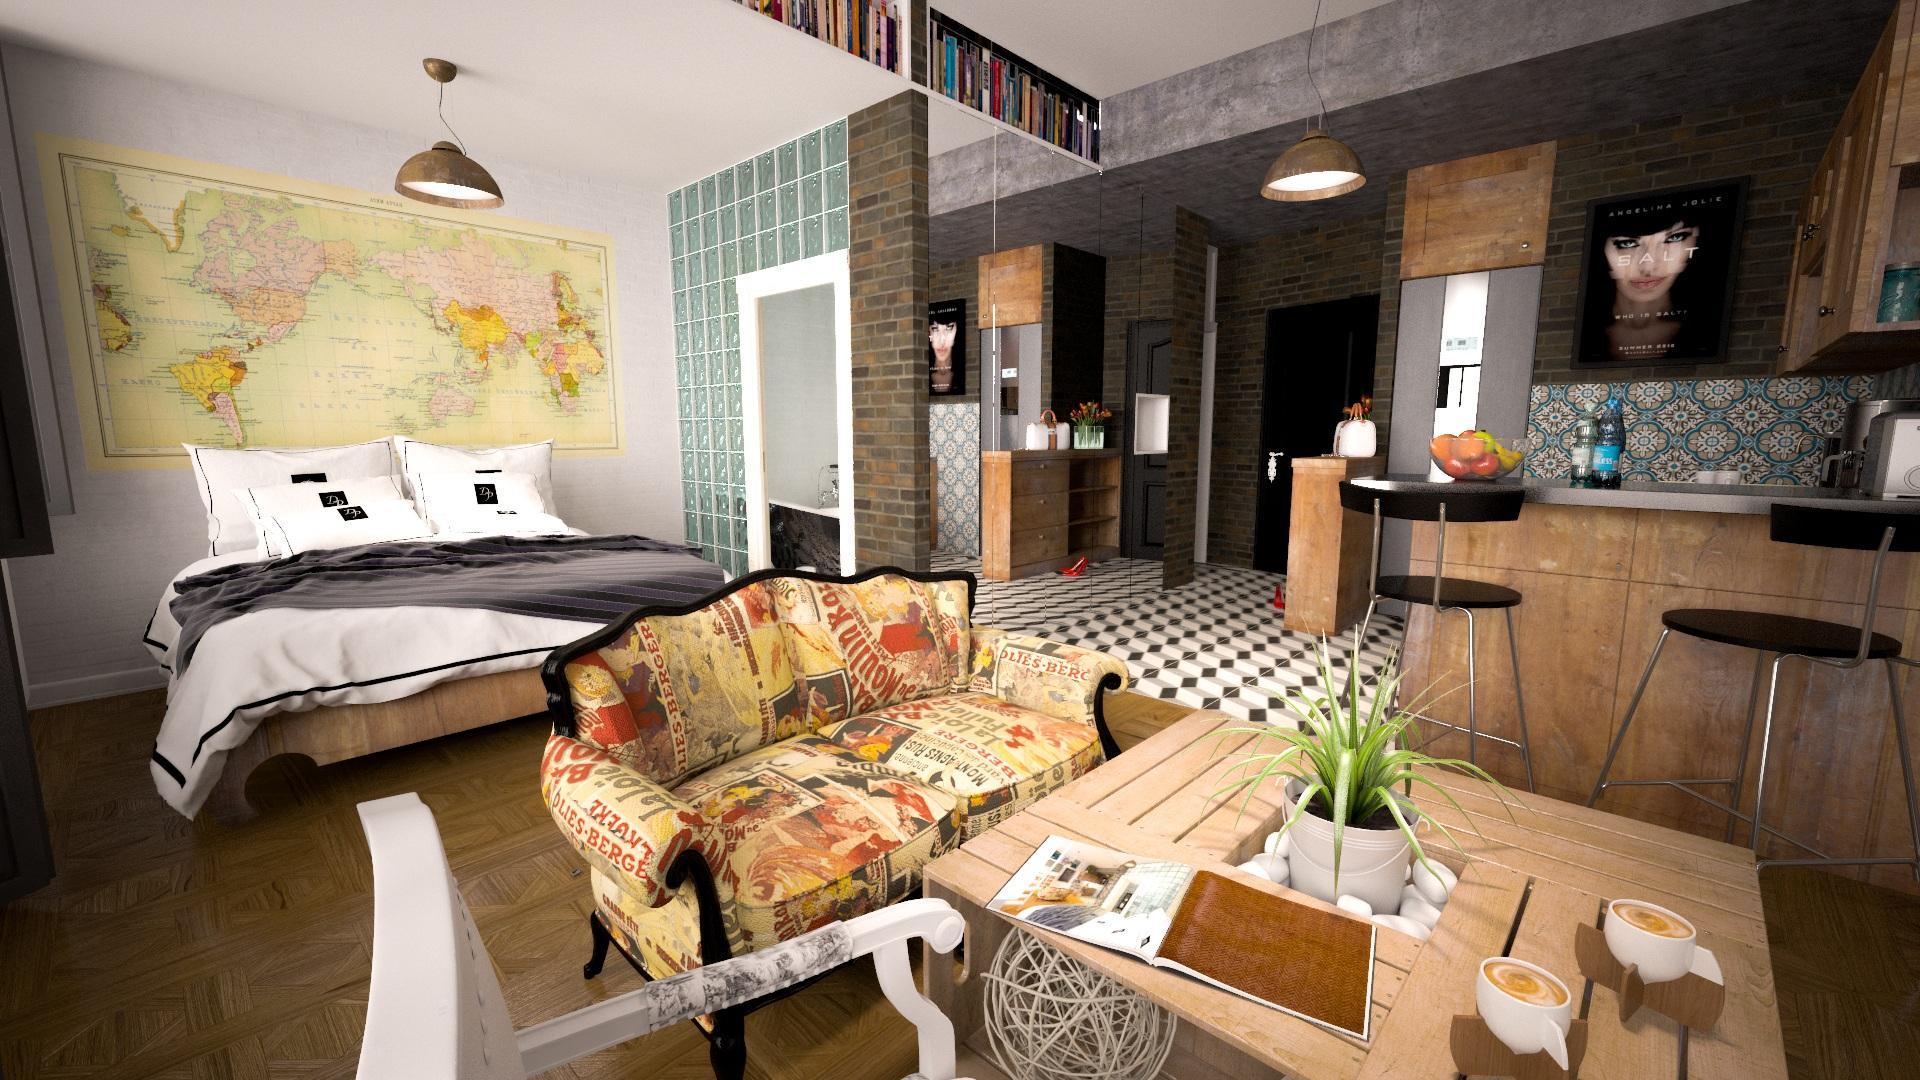 Renovating a Living Room? Experts Share Their Secrets